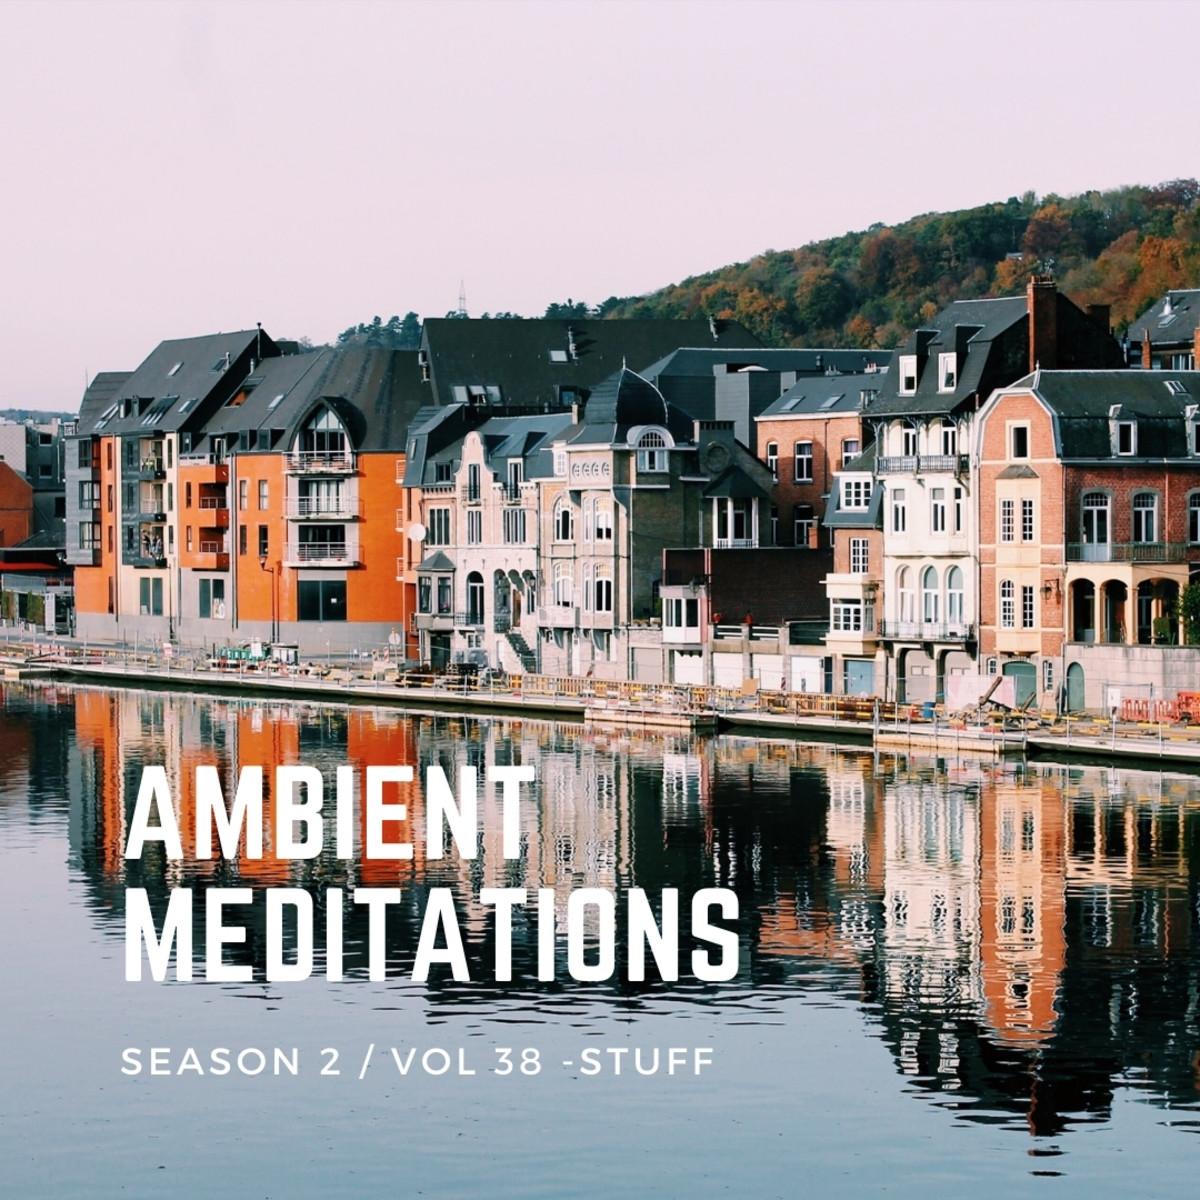 Ambient Meditations Season 2 - Vol 38 - STUFF